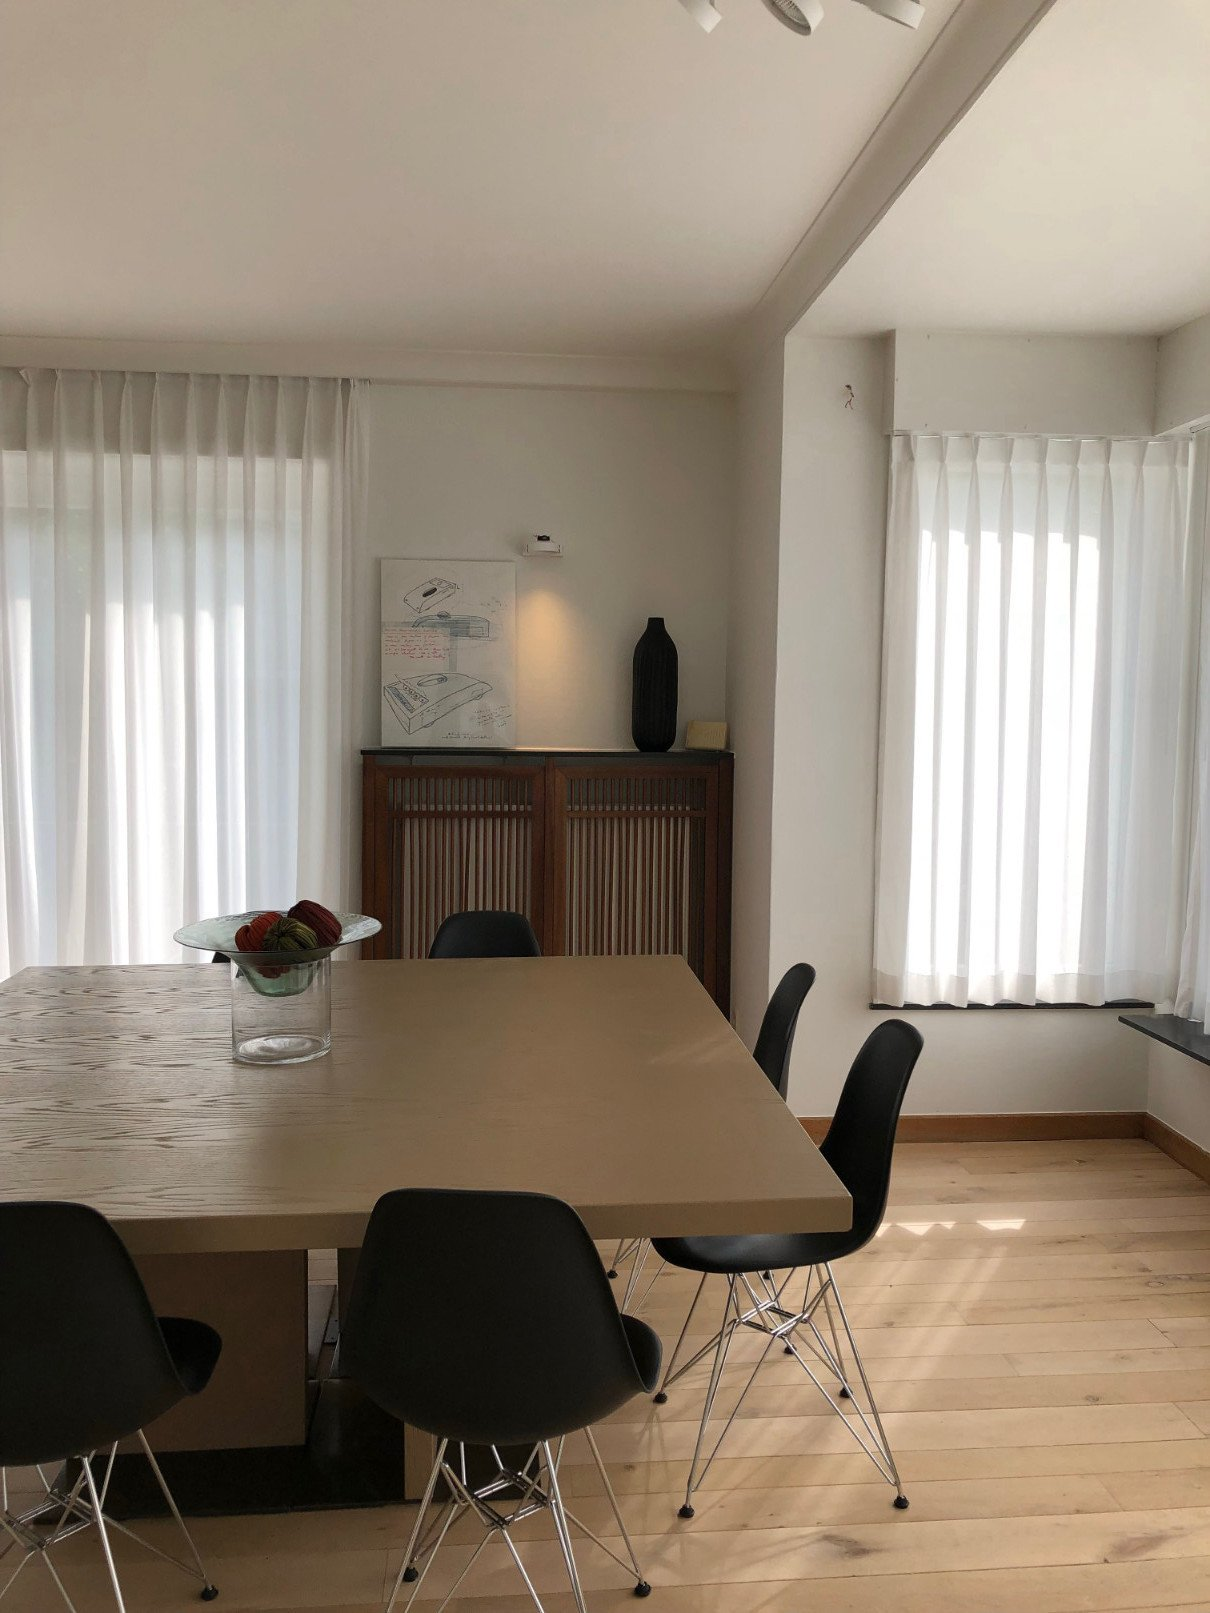 Rietveldprojects-Villa Were Di - Te Koop : Te Huur (per week)30